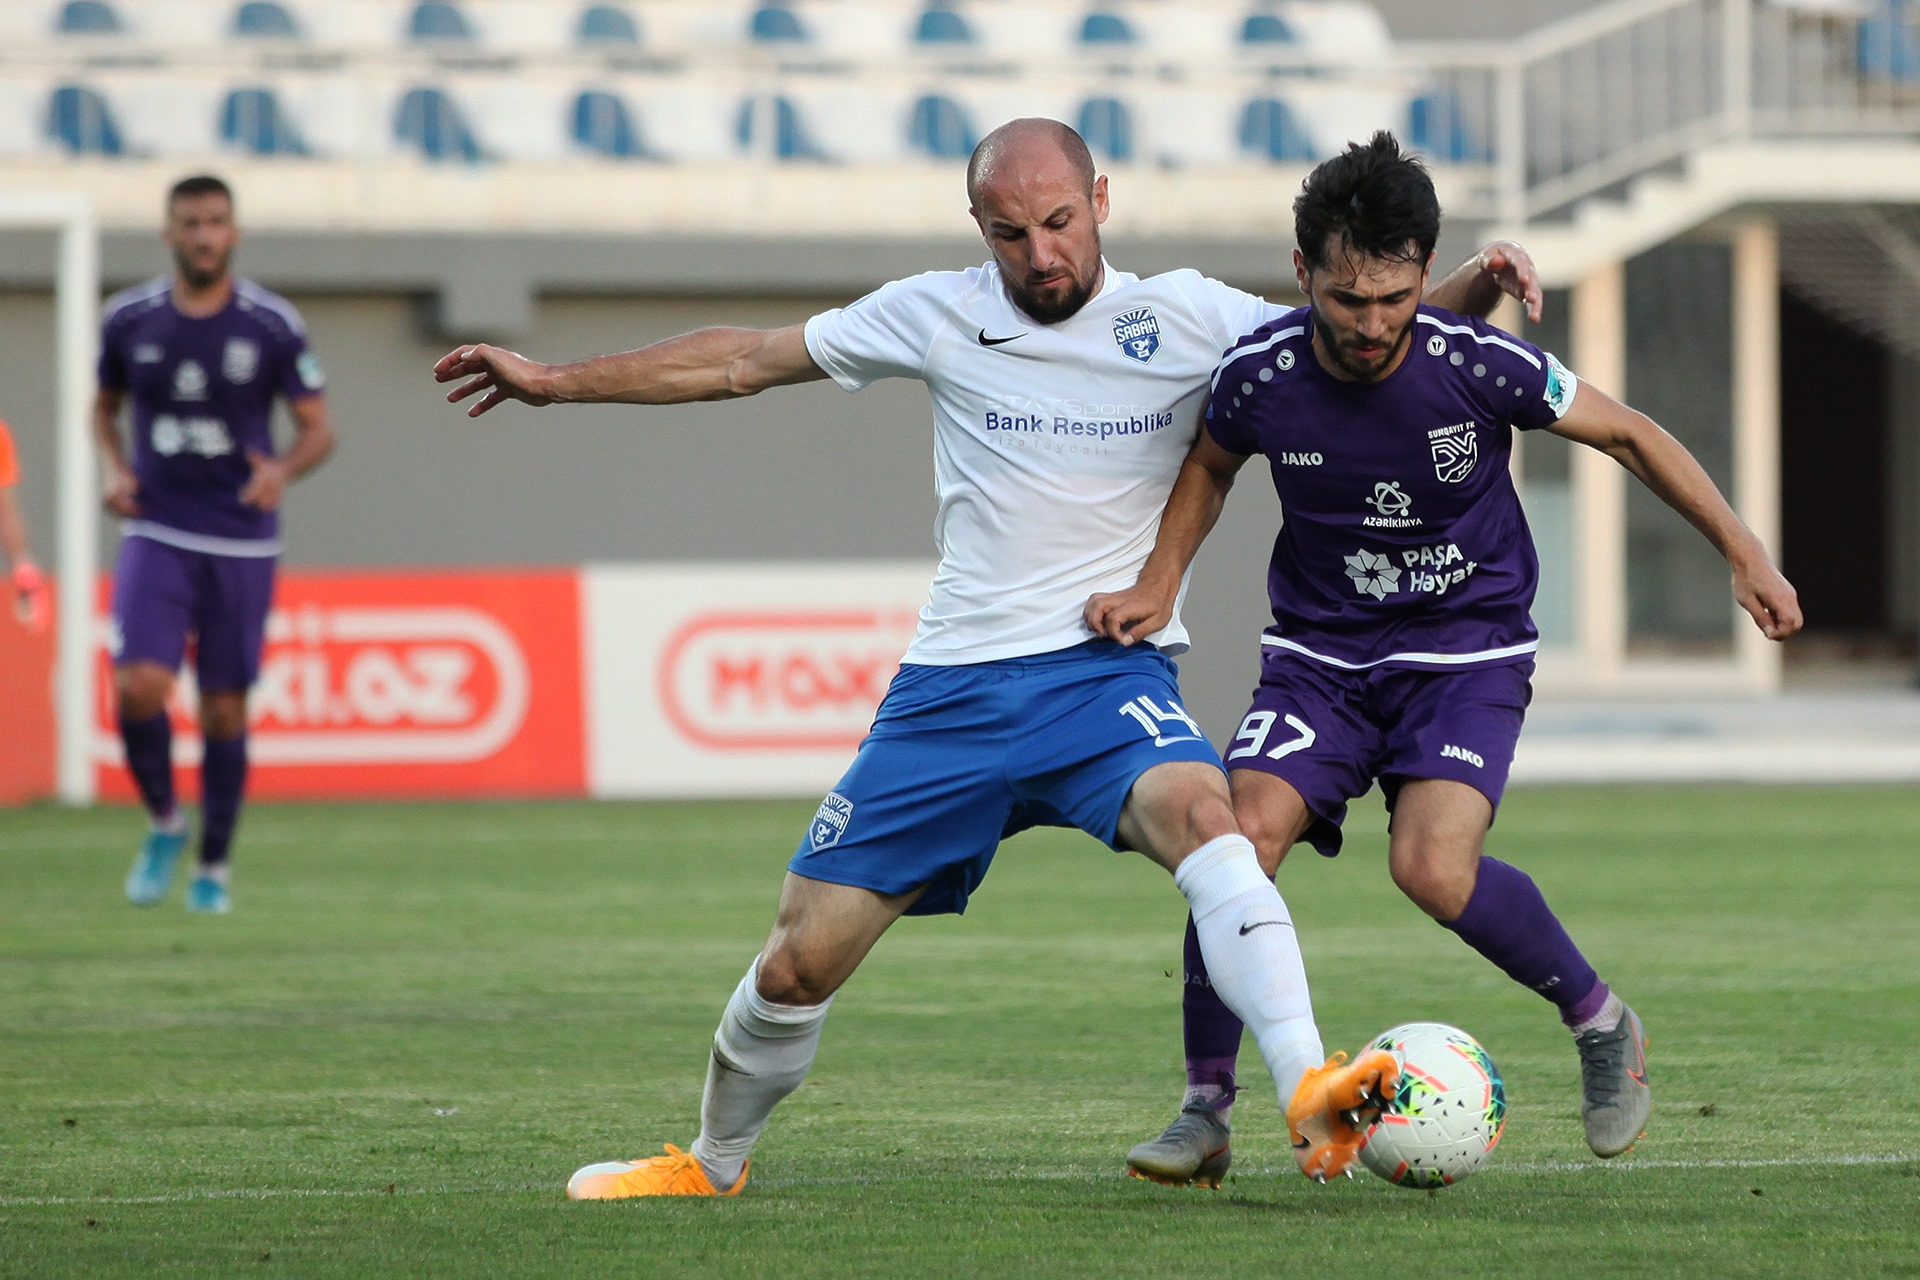 Sabah FC played against Sumgayit FC